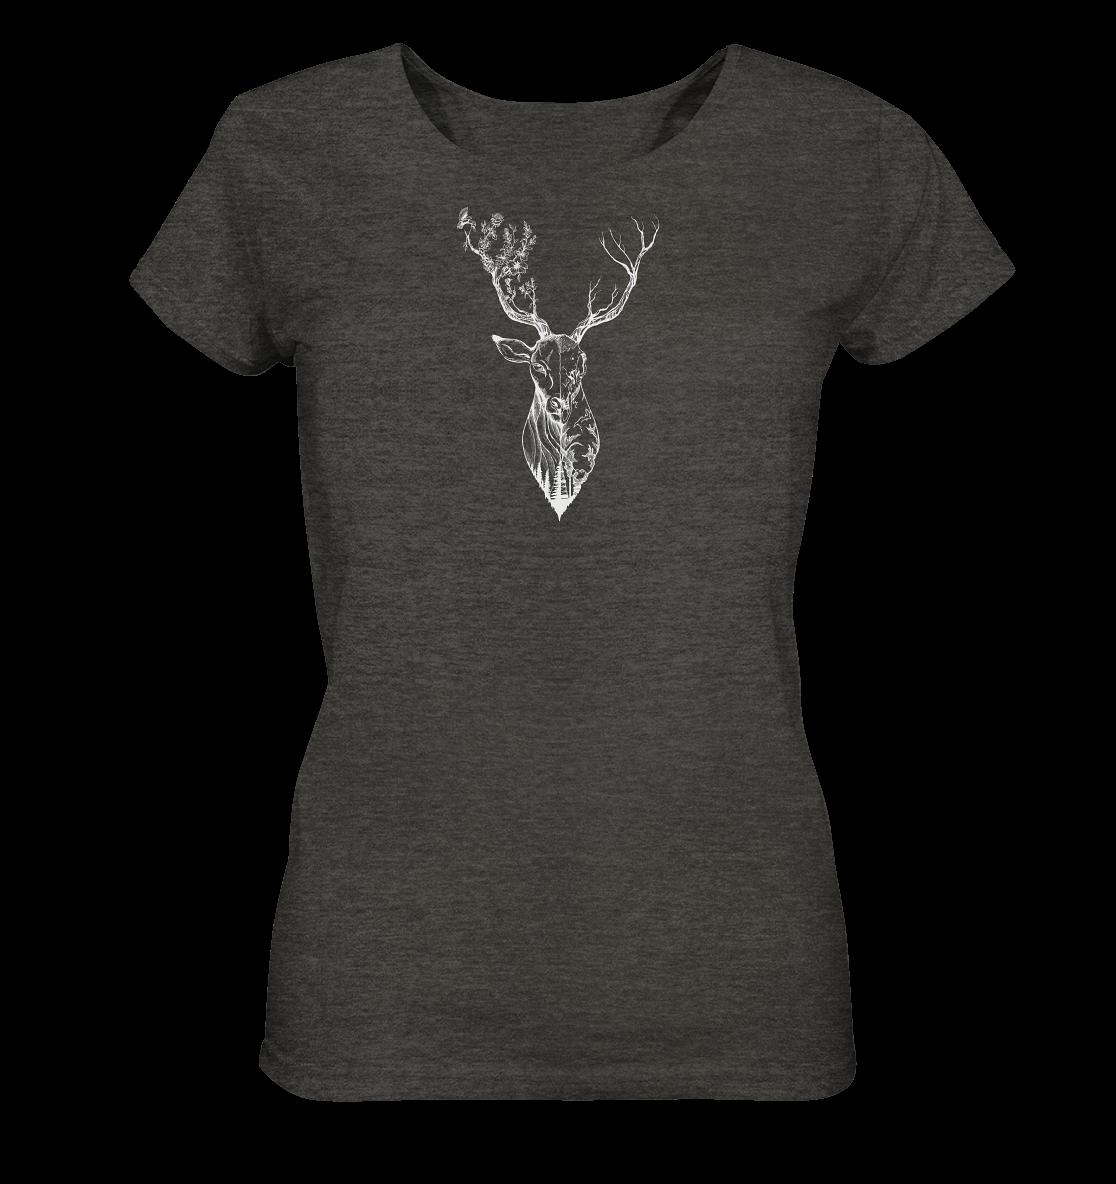 front-ladies-organic-shirt-meliert-252625-1116x-7.png